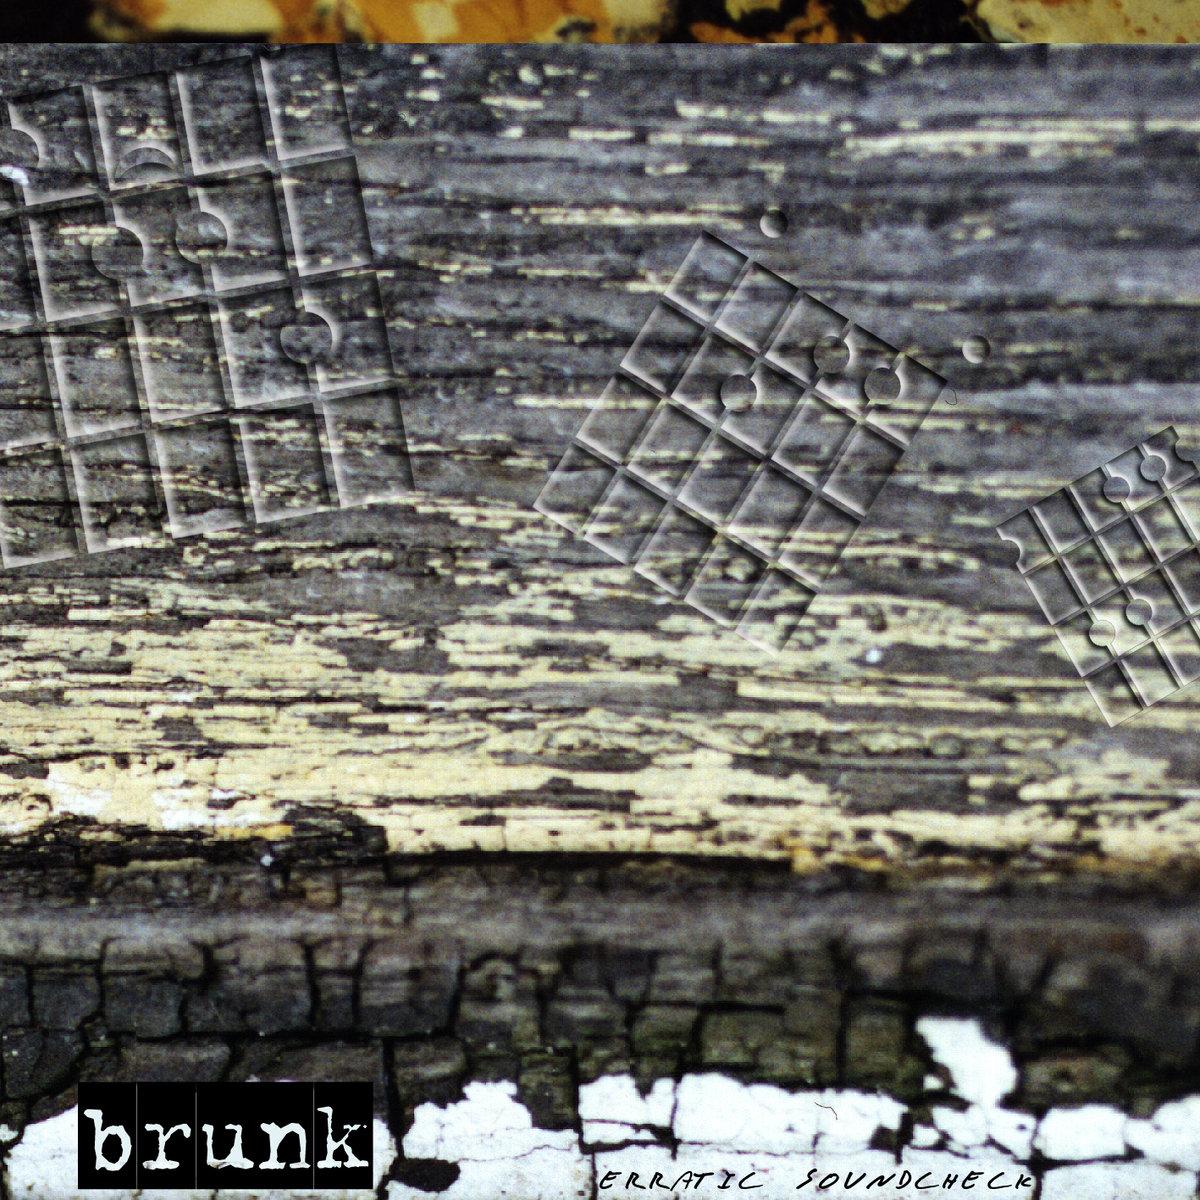 brunk - erratic soundcheck - album artwork - 1999